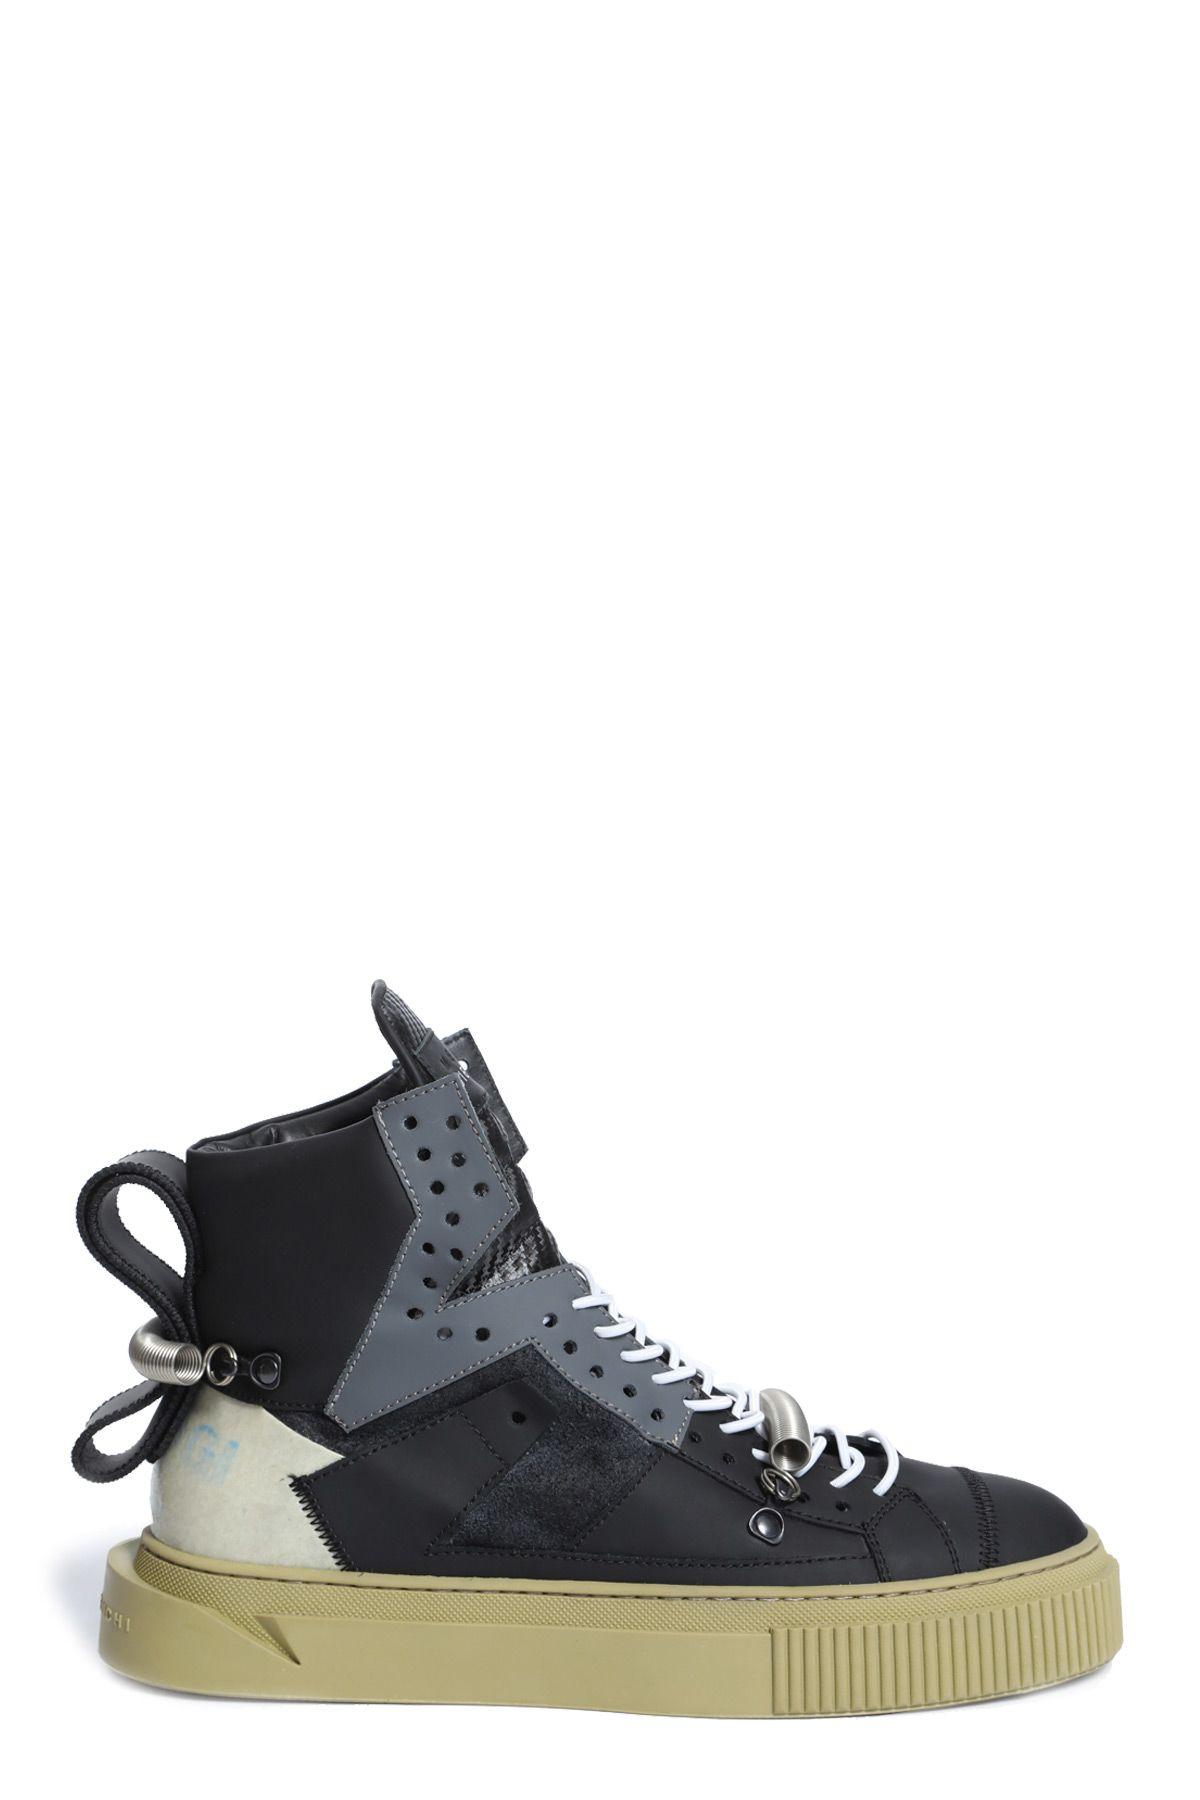 GIENCHI Sneakers in Nero/Grigio